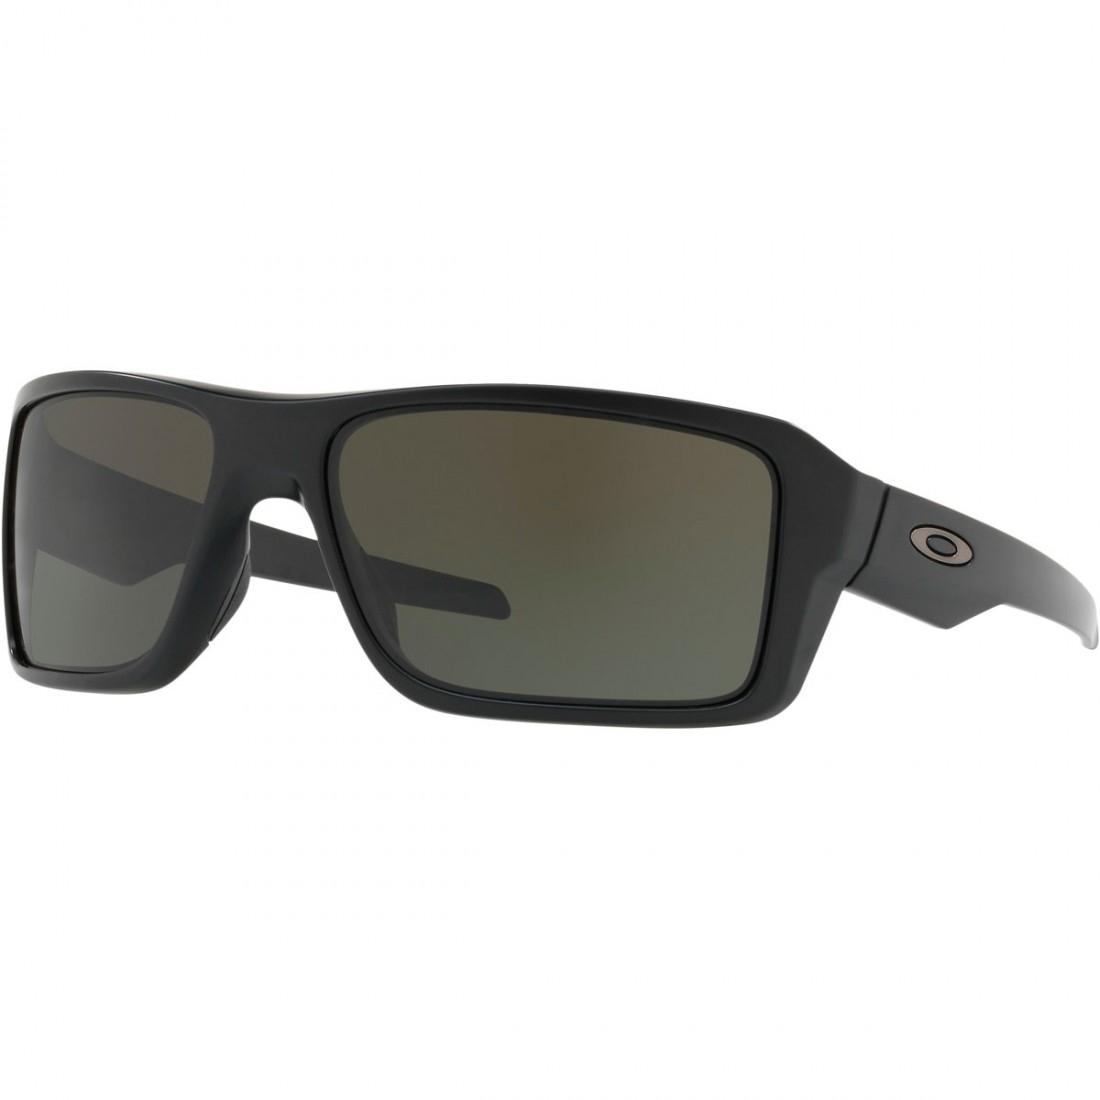 · Gray Motocard Gafas Matte Black Double Edge Oakley Dark Sol De zpGUqVSM